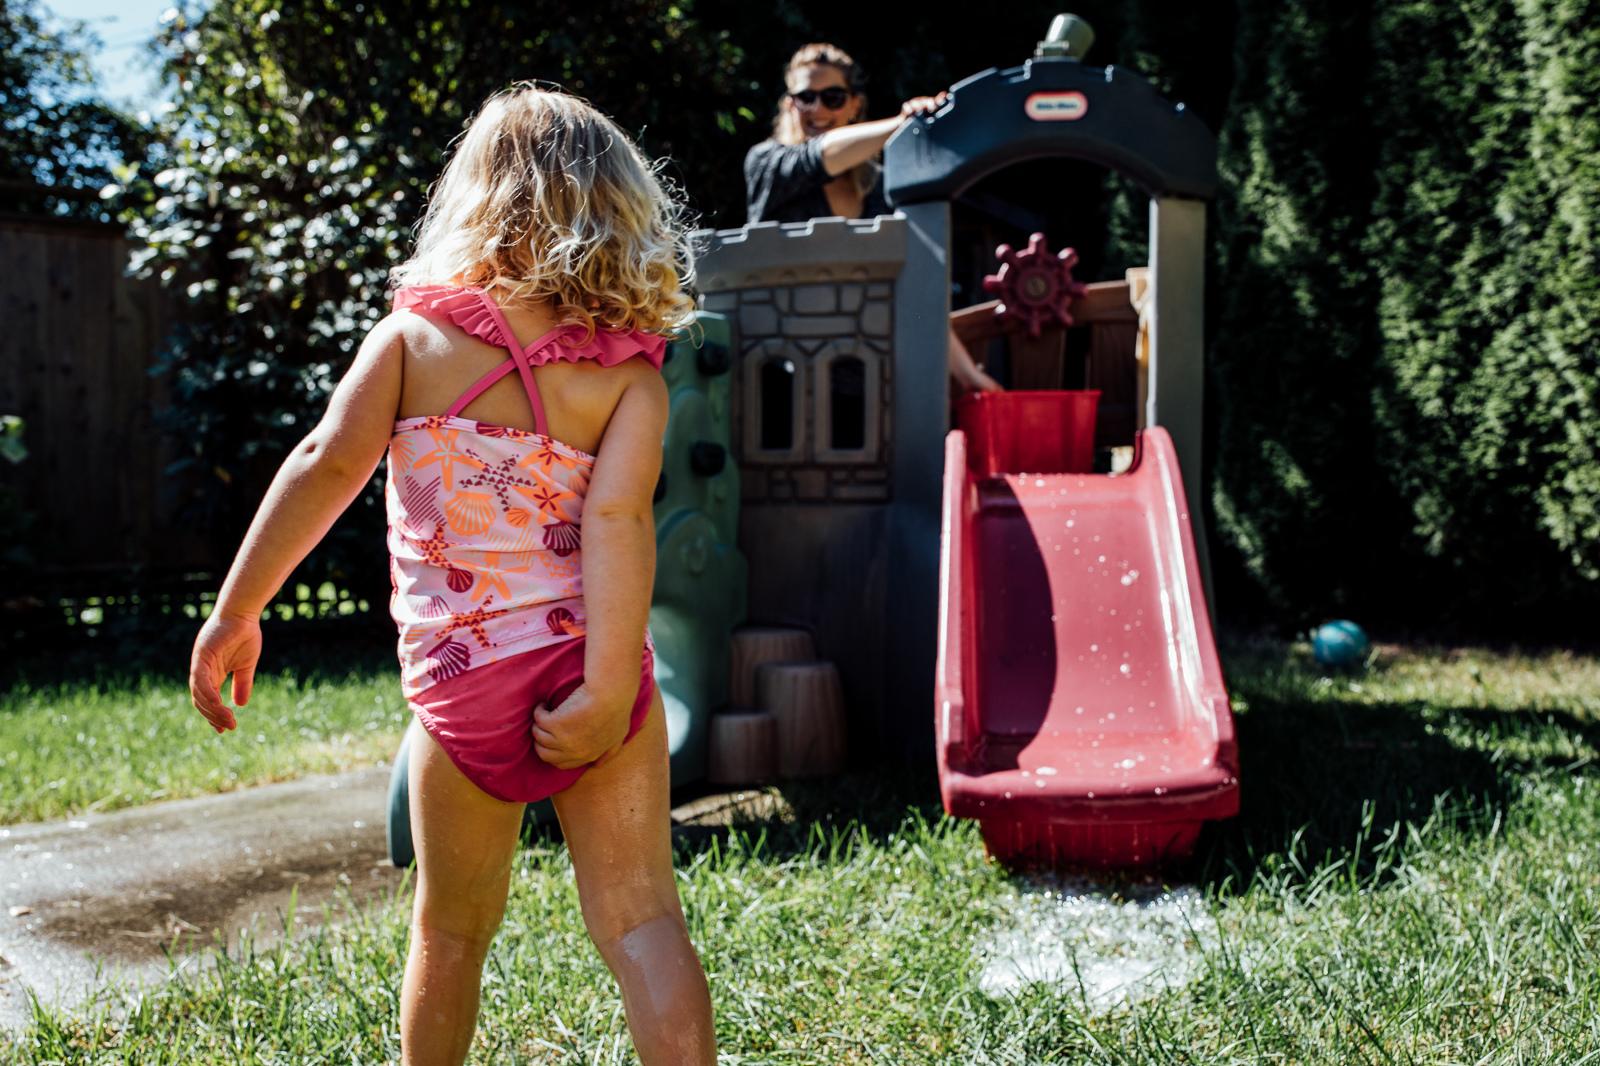 toddler pulls at bathing suit after sliding